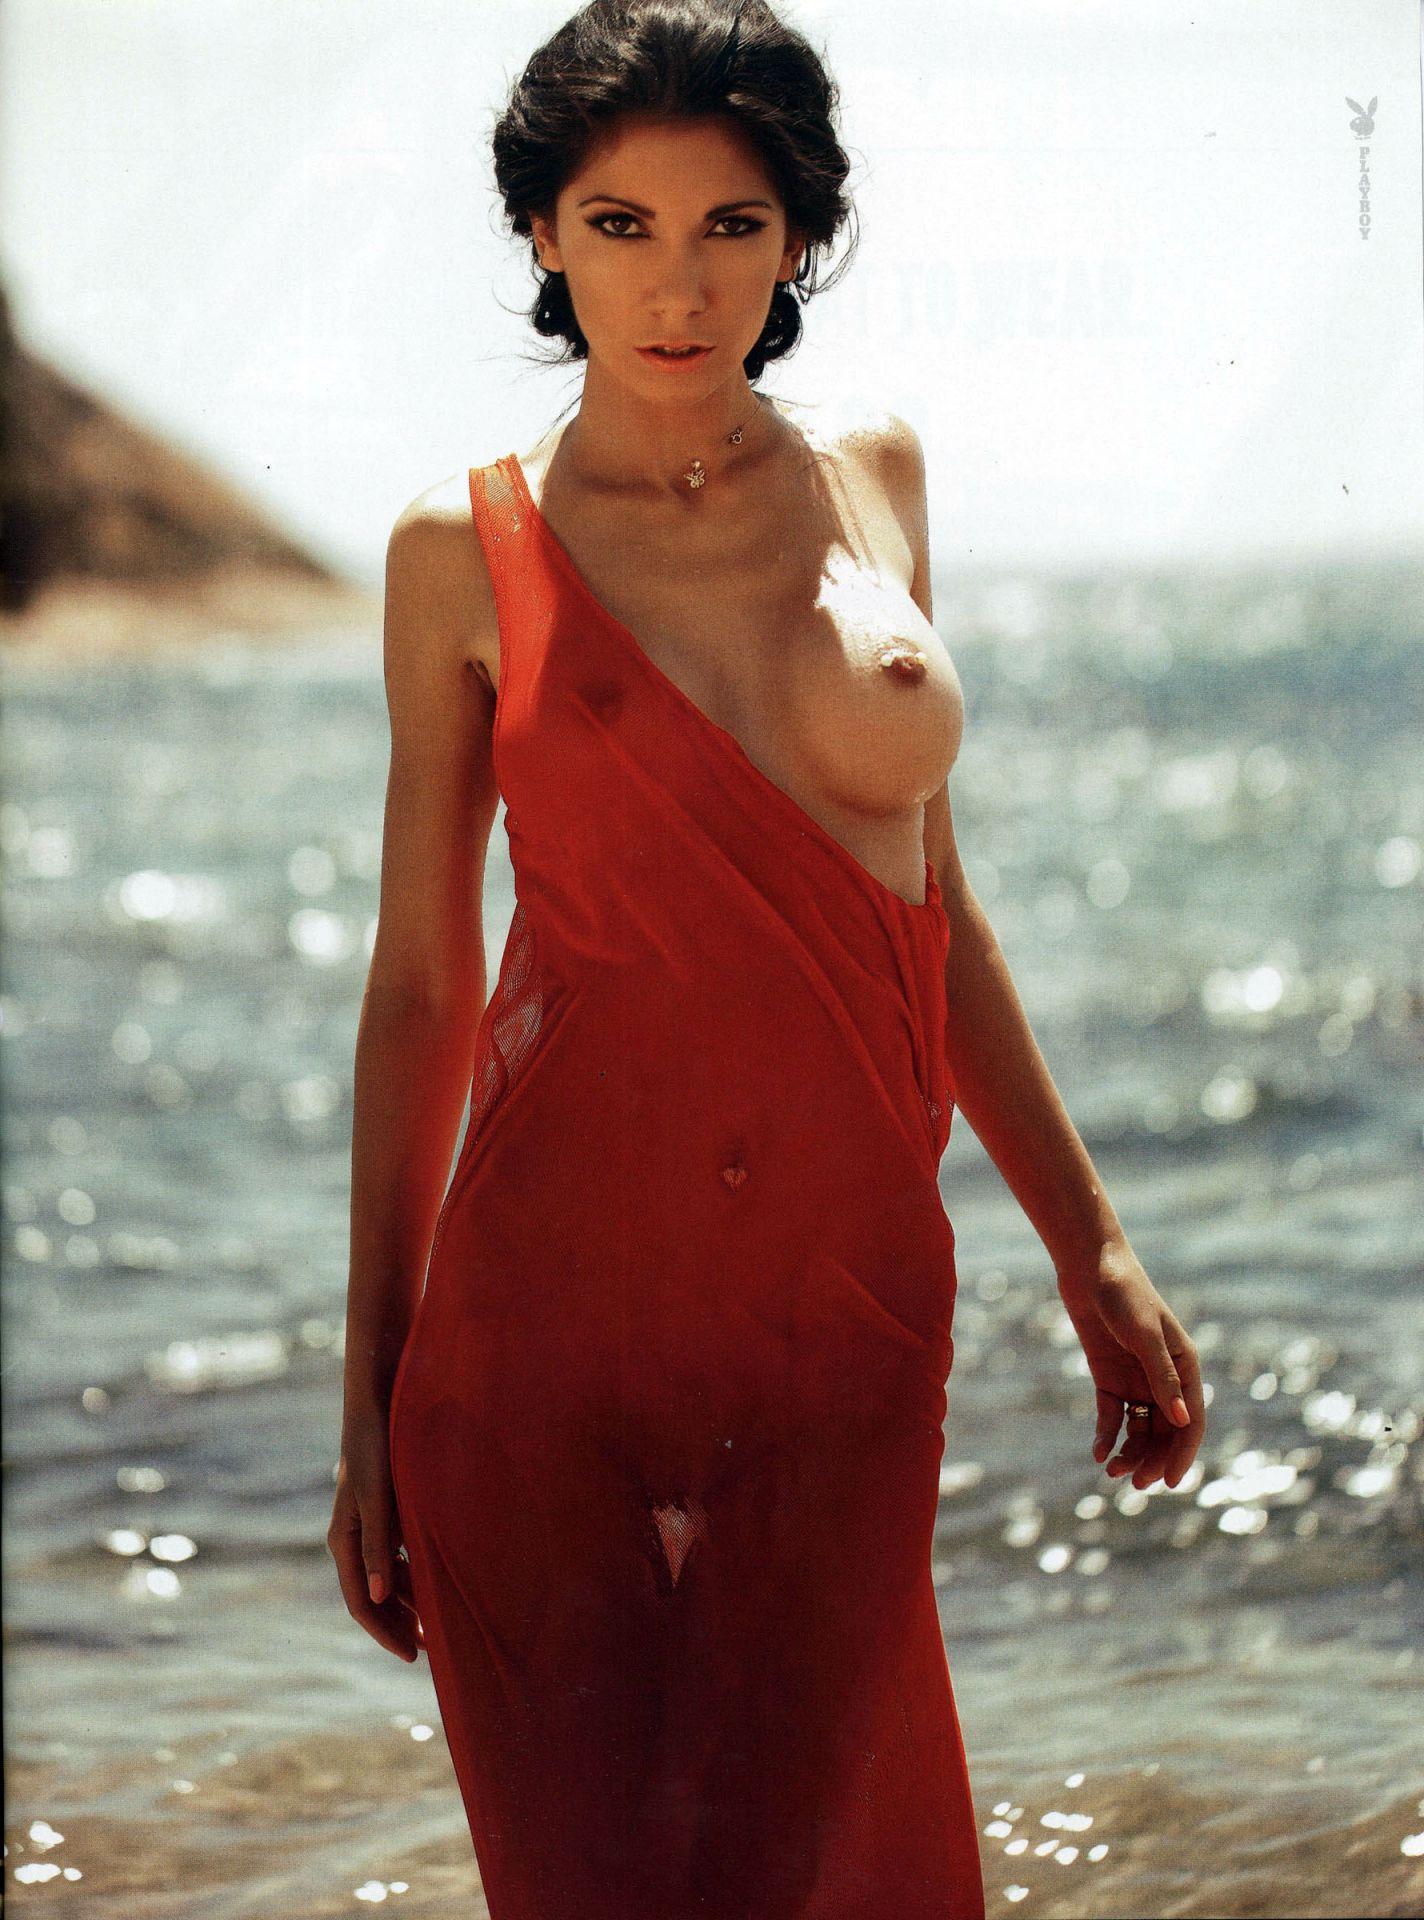 Kristina Dimitrova naked photos (5)